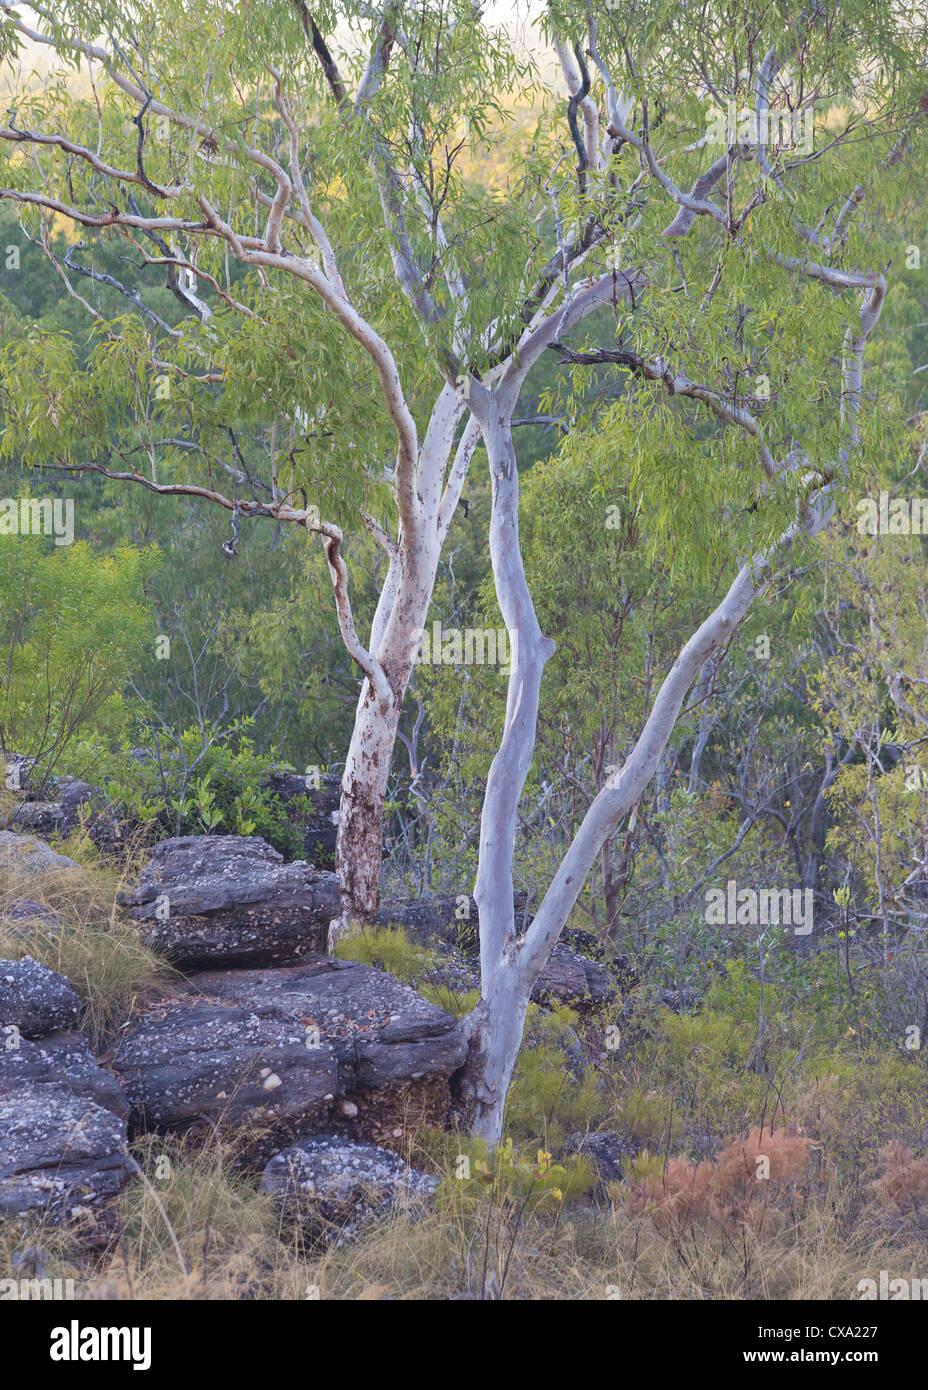 Eucalyptus Trees, Kakadu National Park, Northern Territory - Stock Image